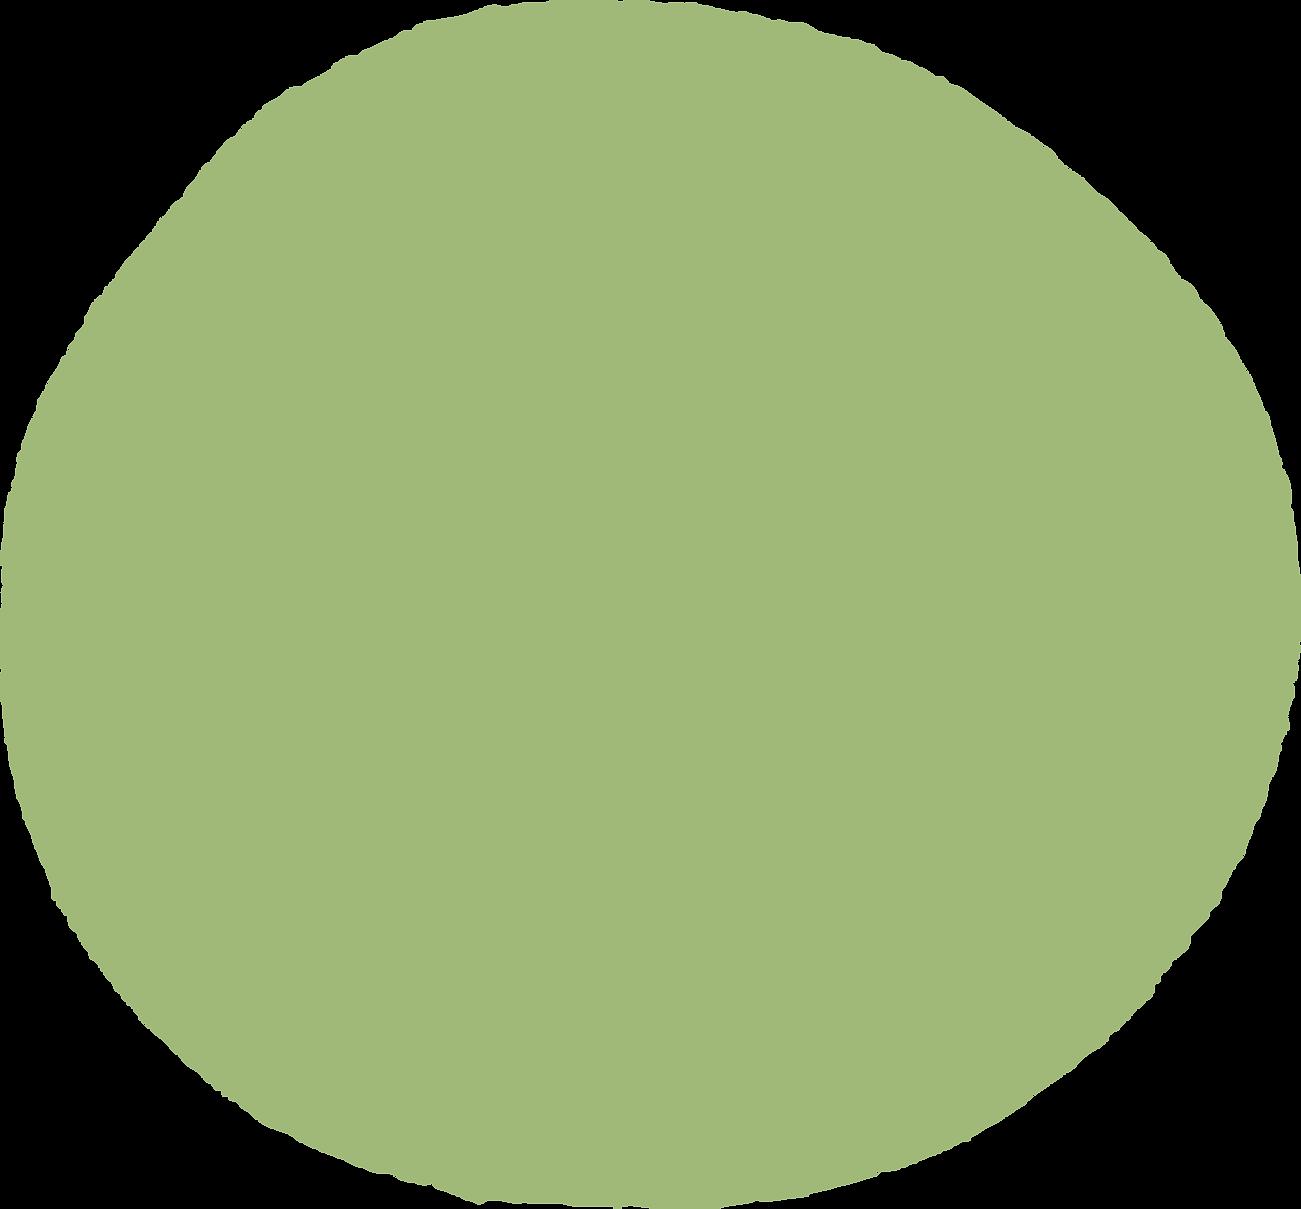 bola verde.png